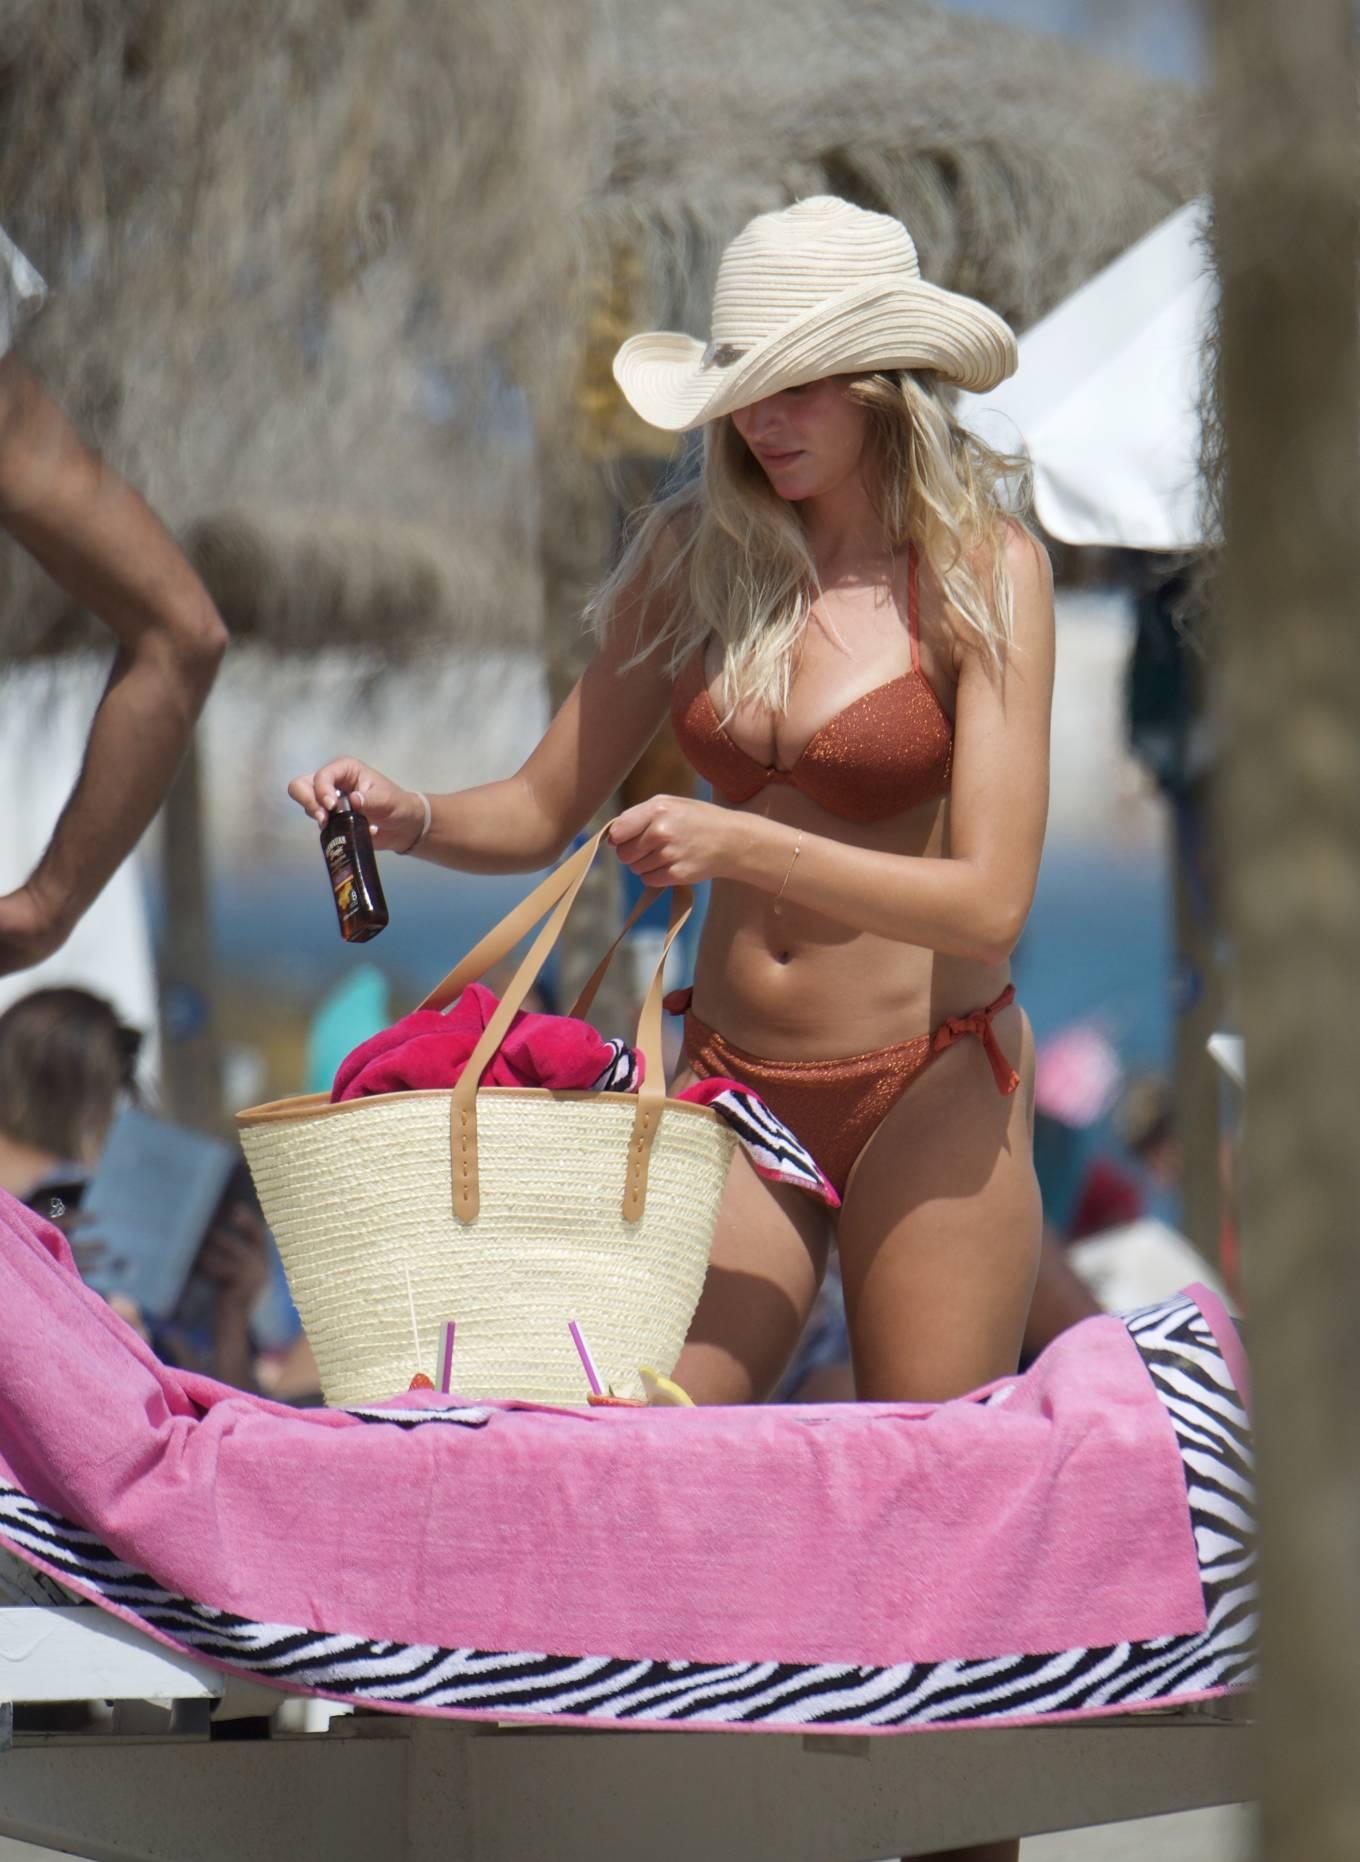 Zara McDermott 2020 : Zara McDermott in Bikini 2020-06